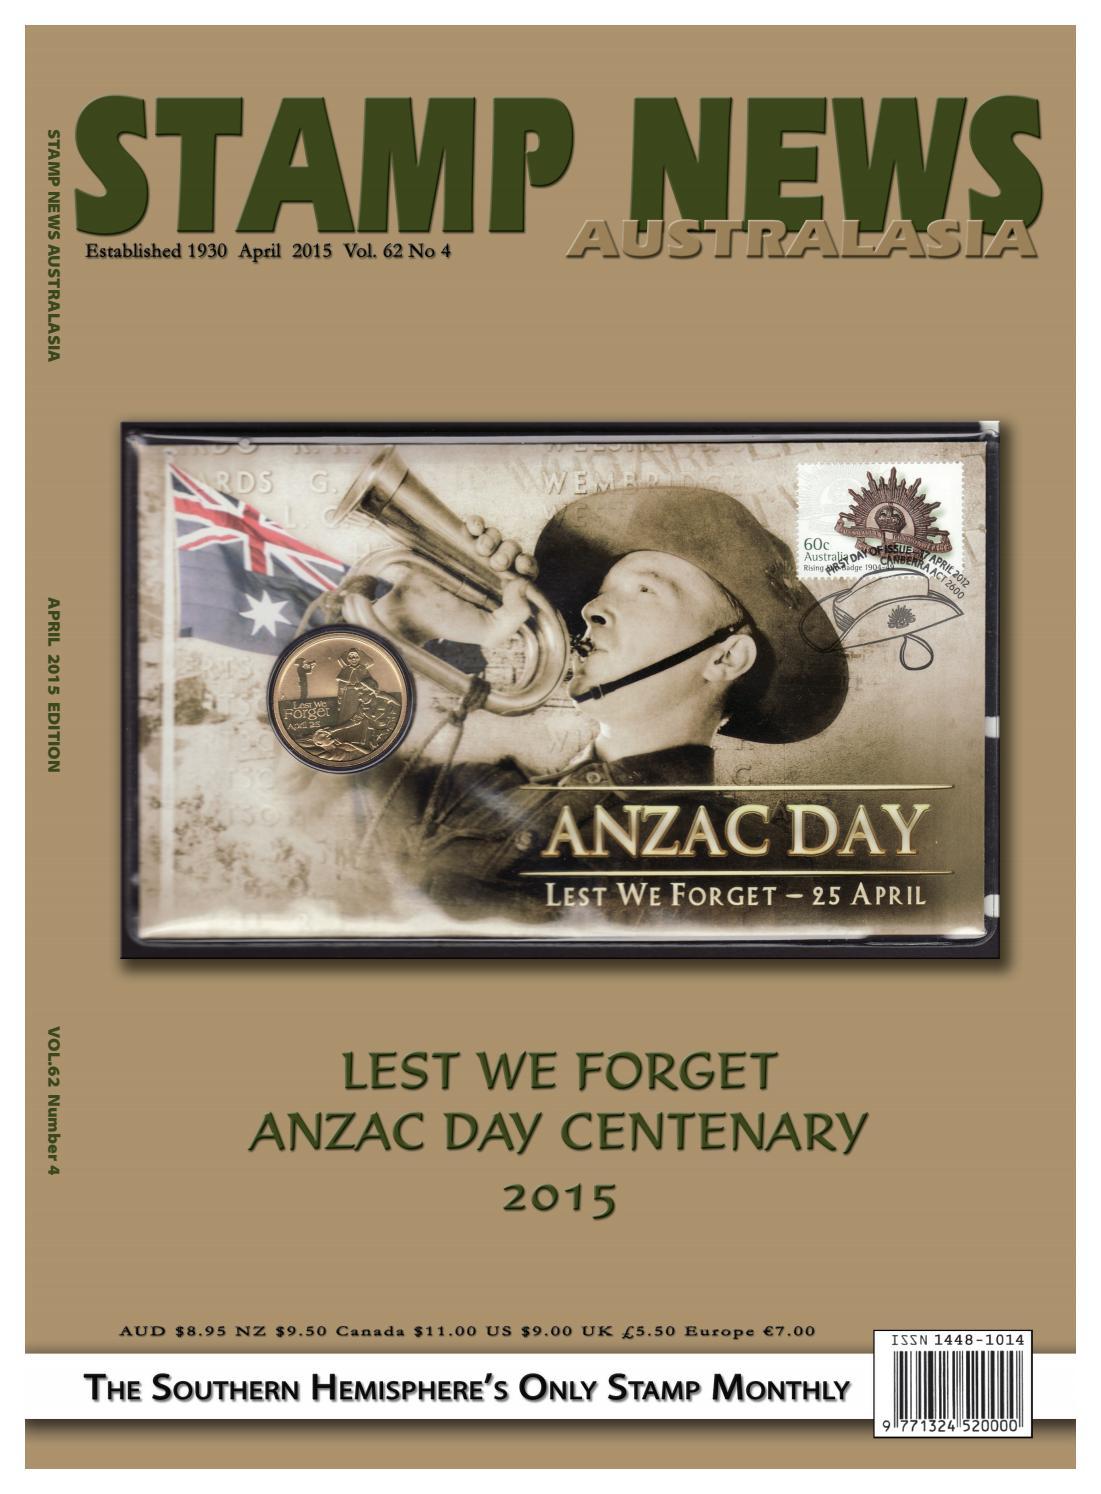 february 2015 tuvalu home.htm stamp news australasia april 2015 by stamp news australasia issuu  stamp news australasia april 2015 by